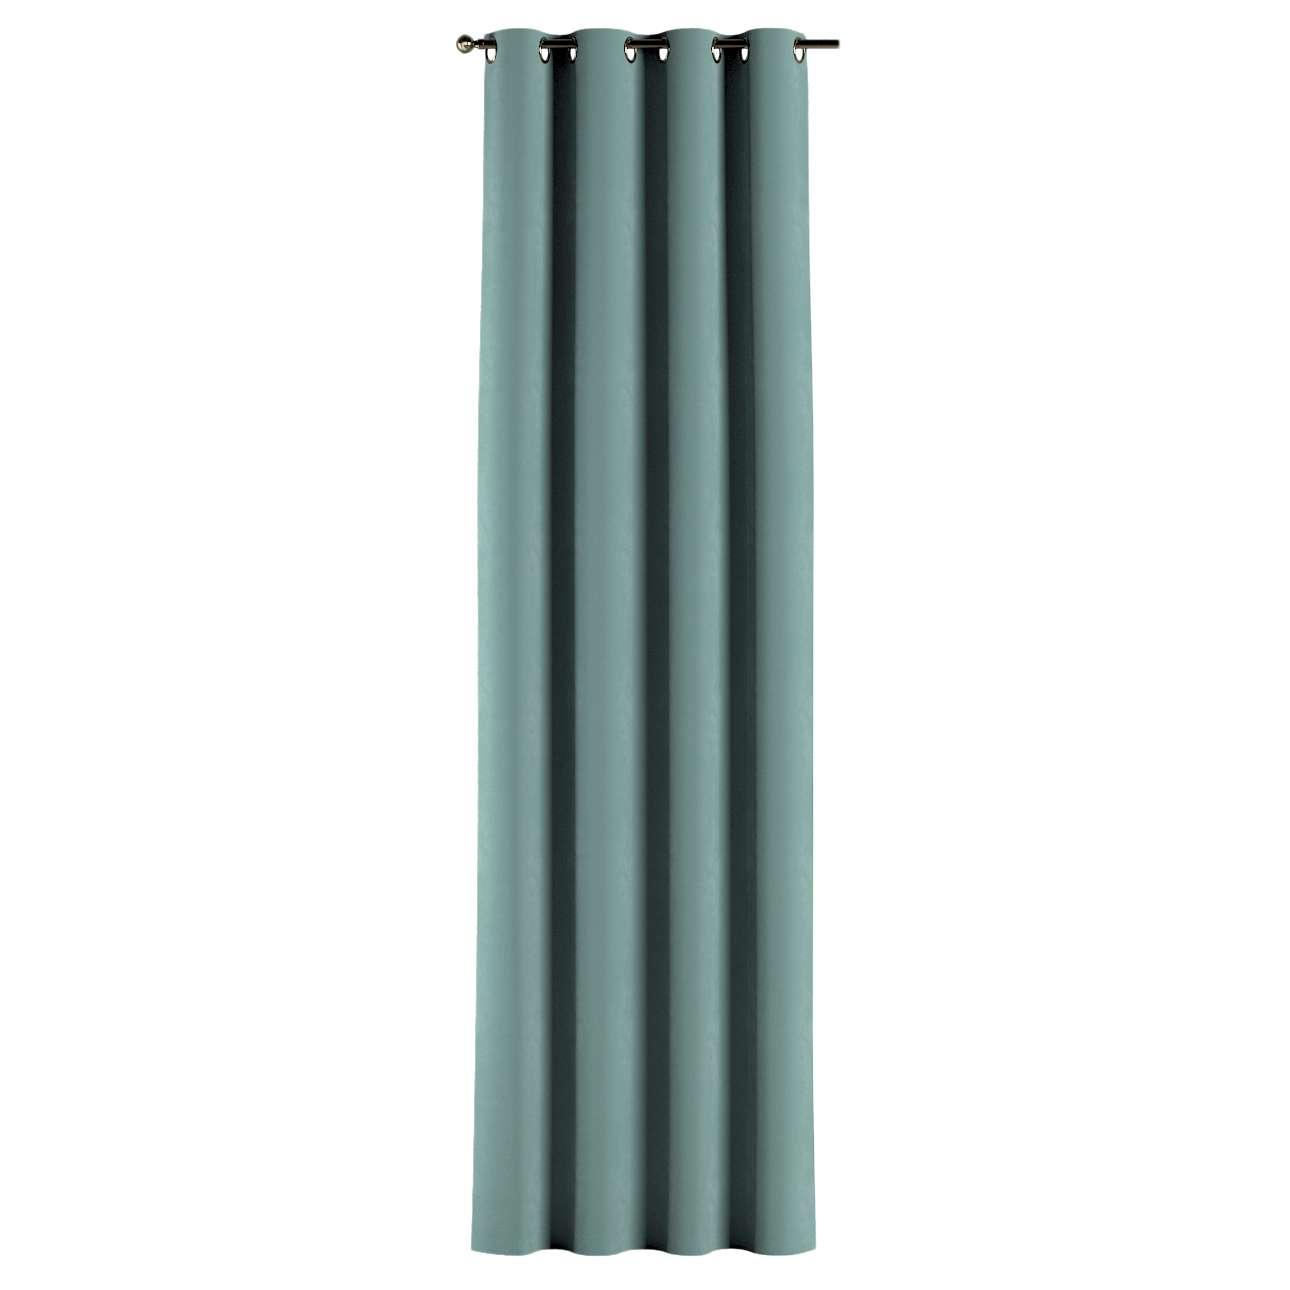 Záves s kolieskami 130 × 260 cm V kolekcii Velvet, tkanina: 704-18